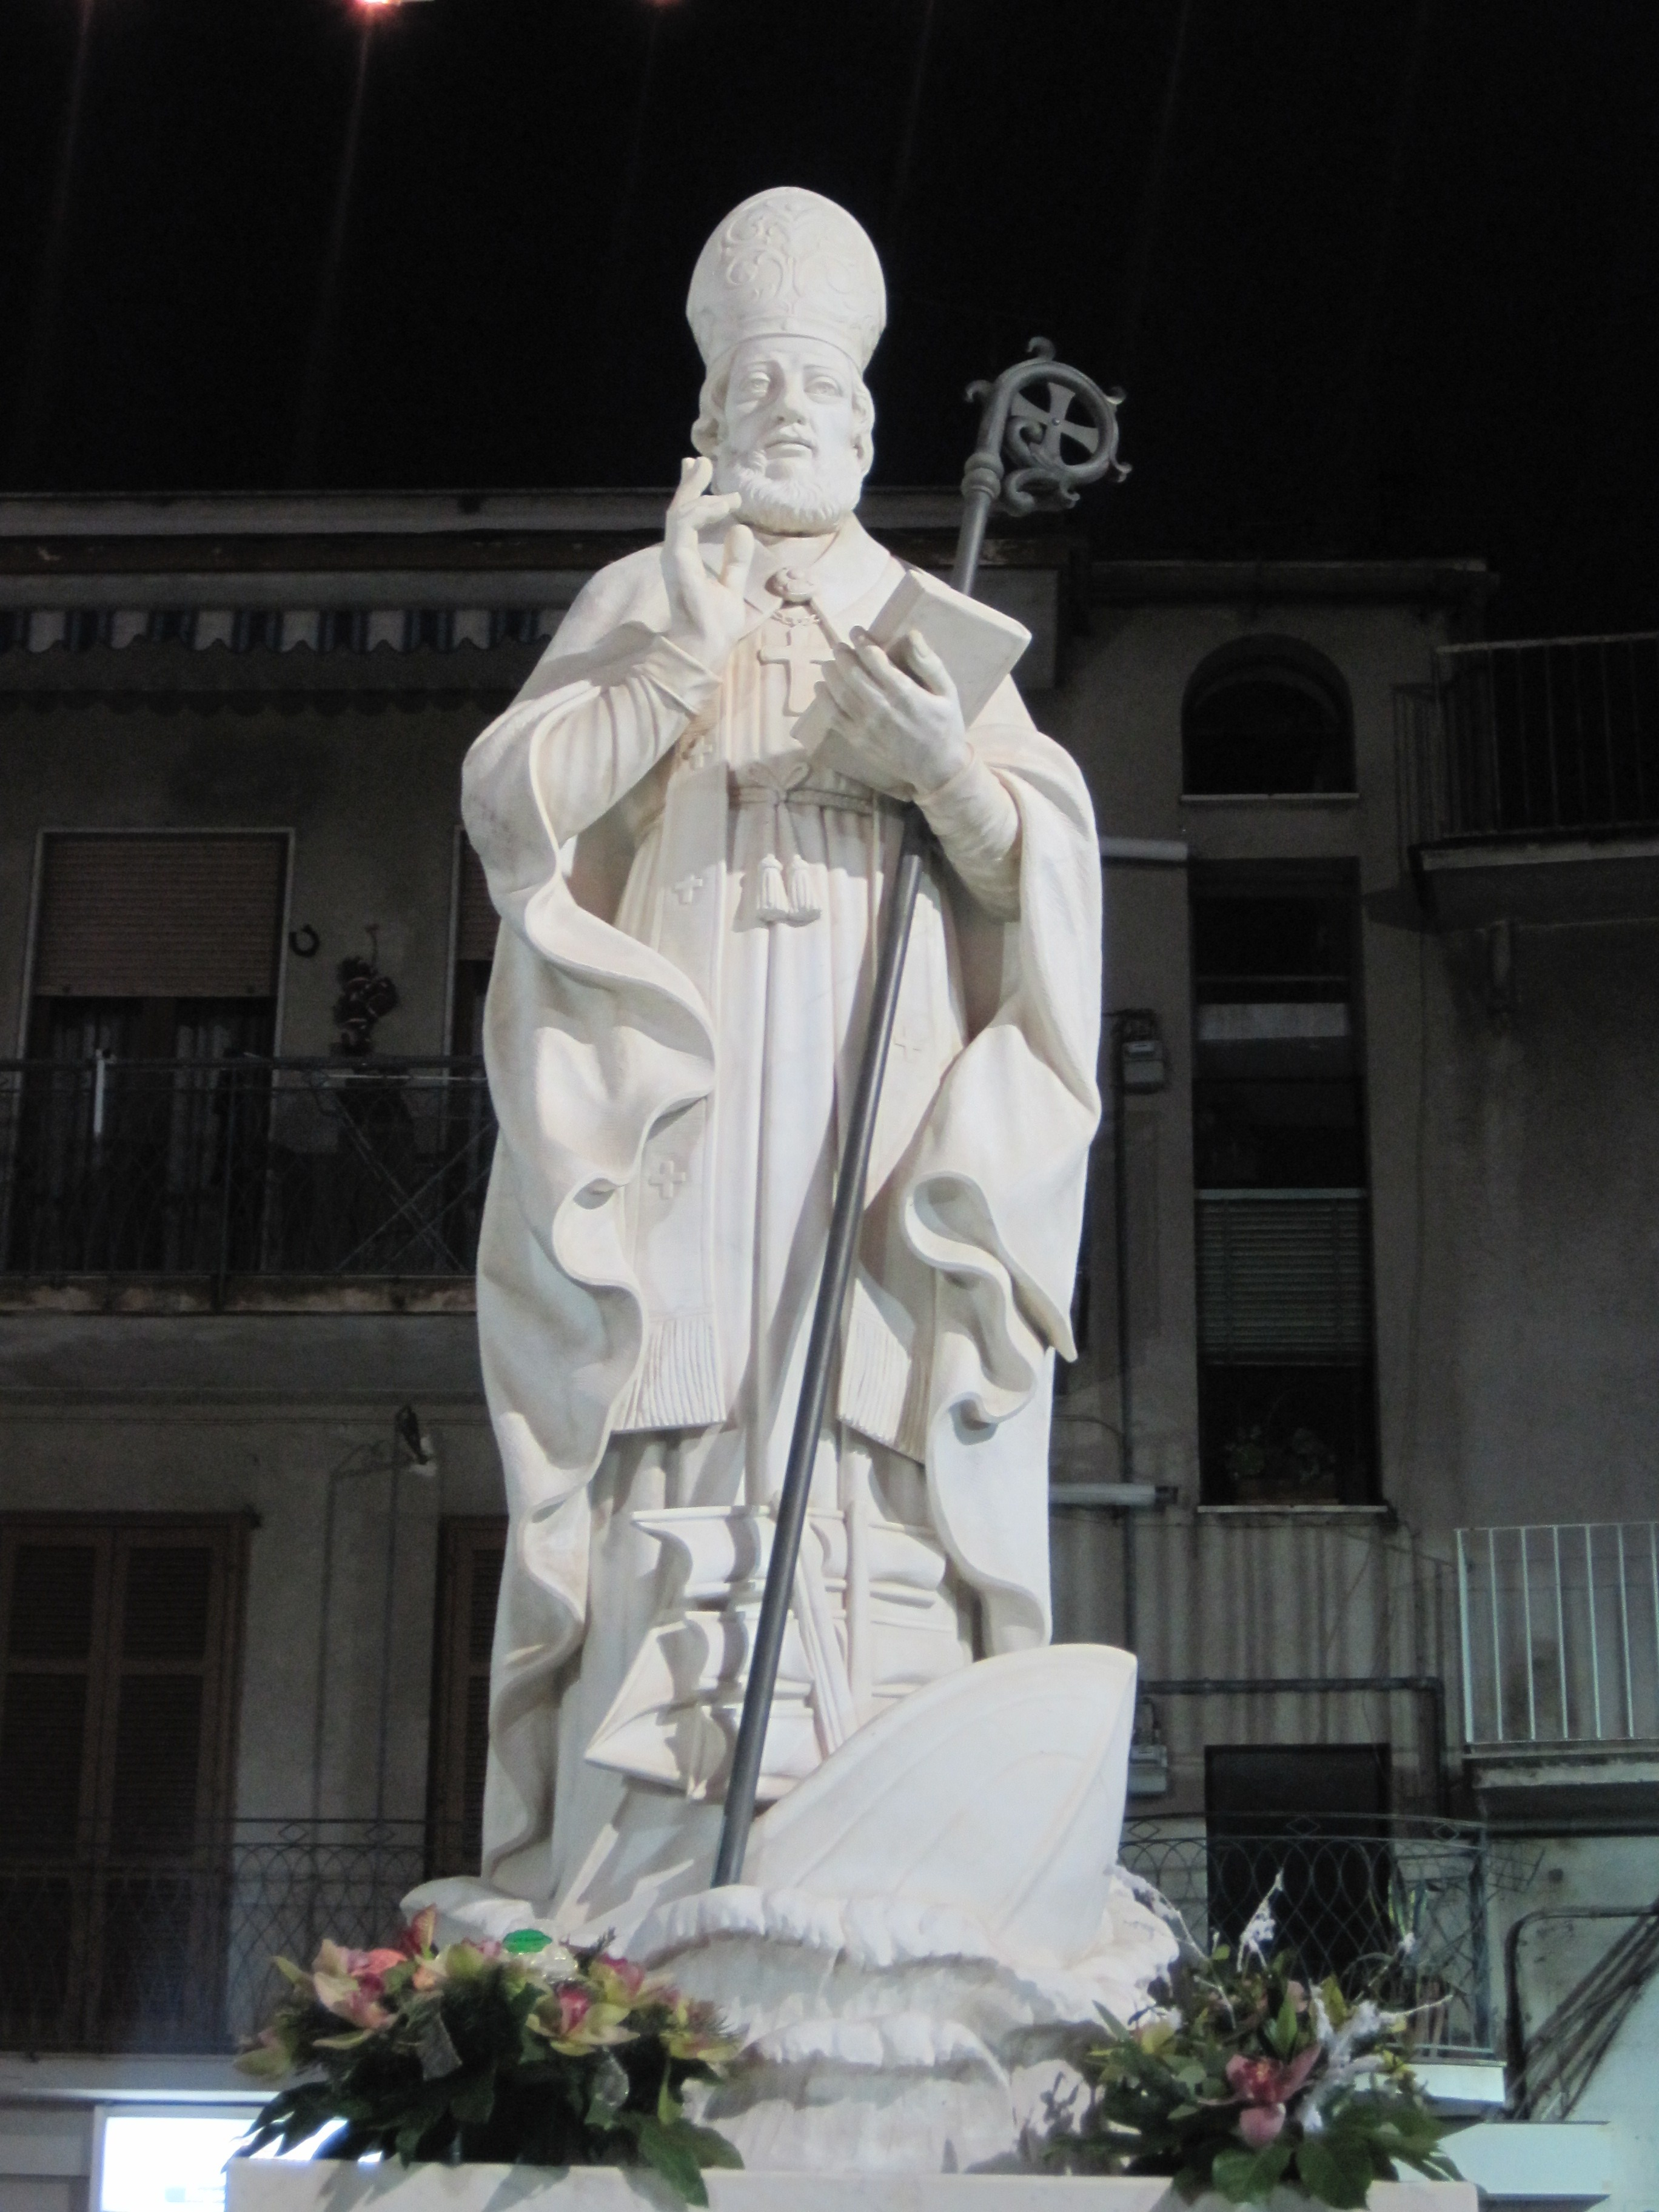 Marmorstatue av Paulinus i Via Ottaviano Augusto i Nola